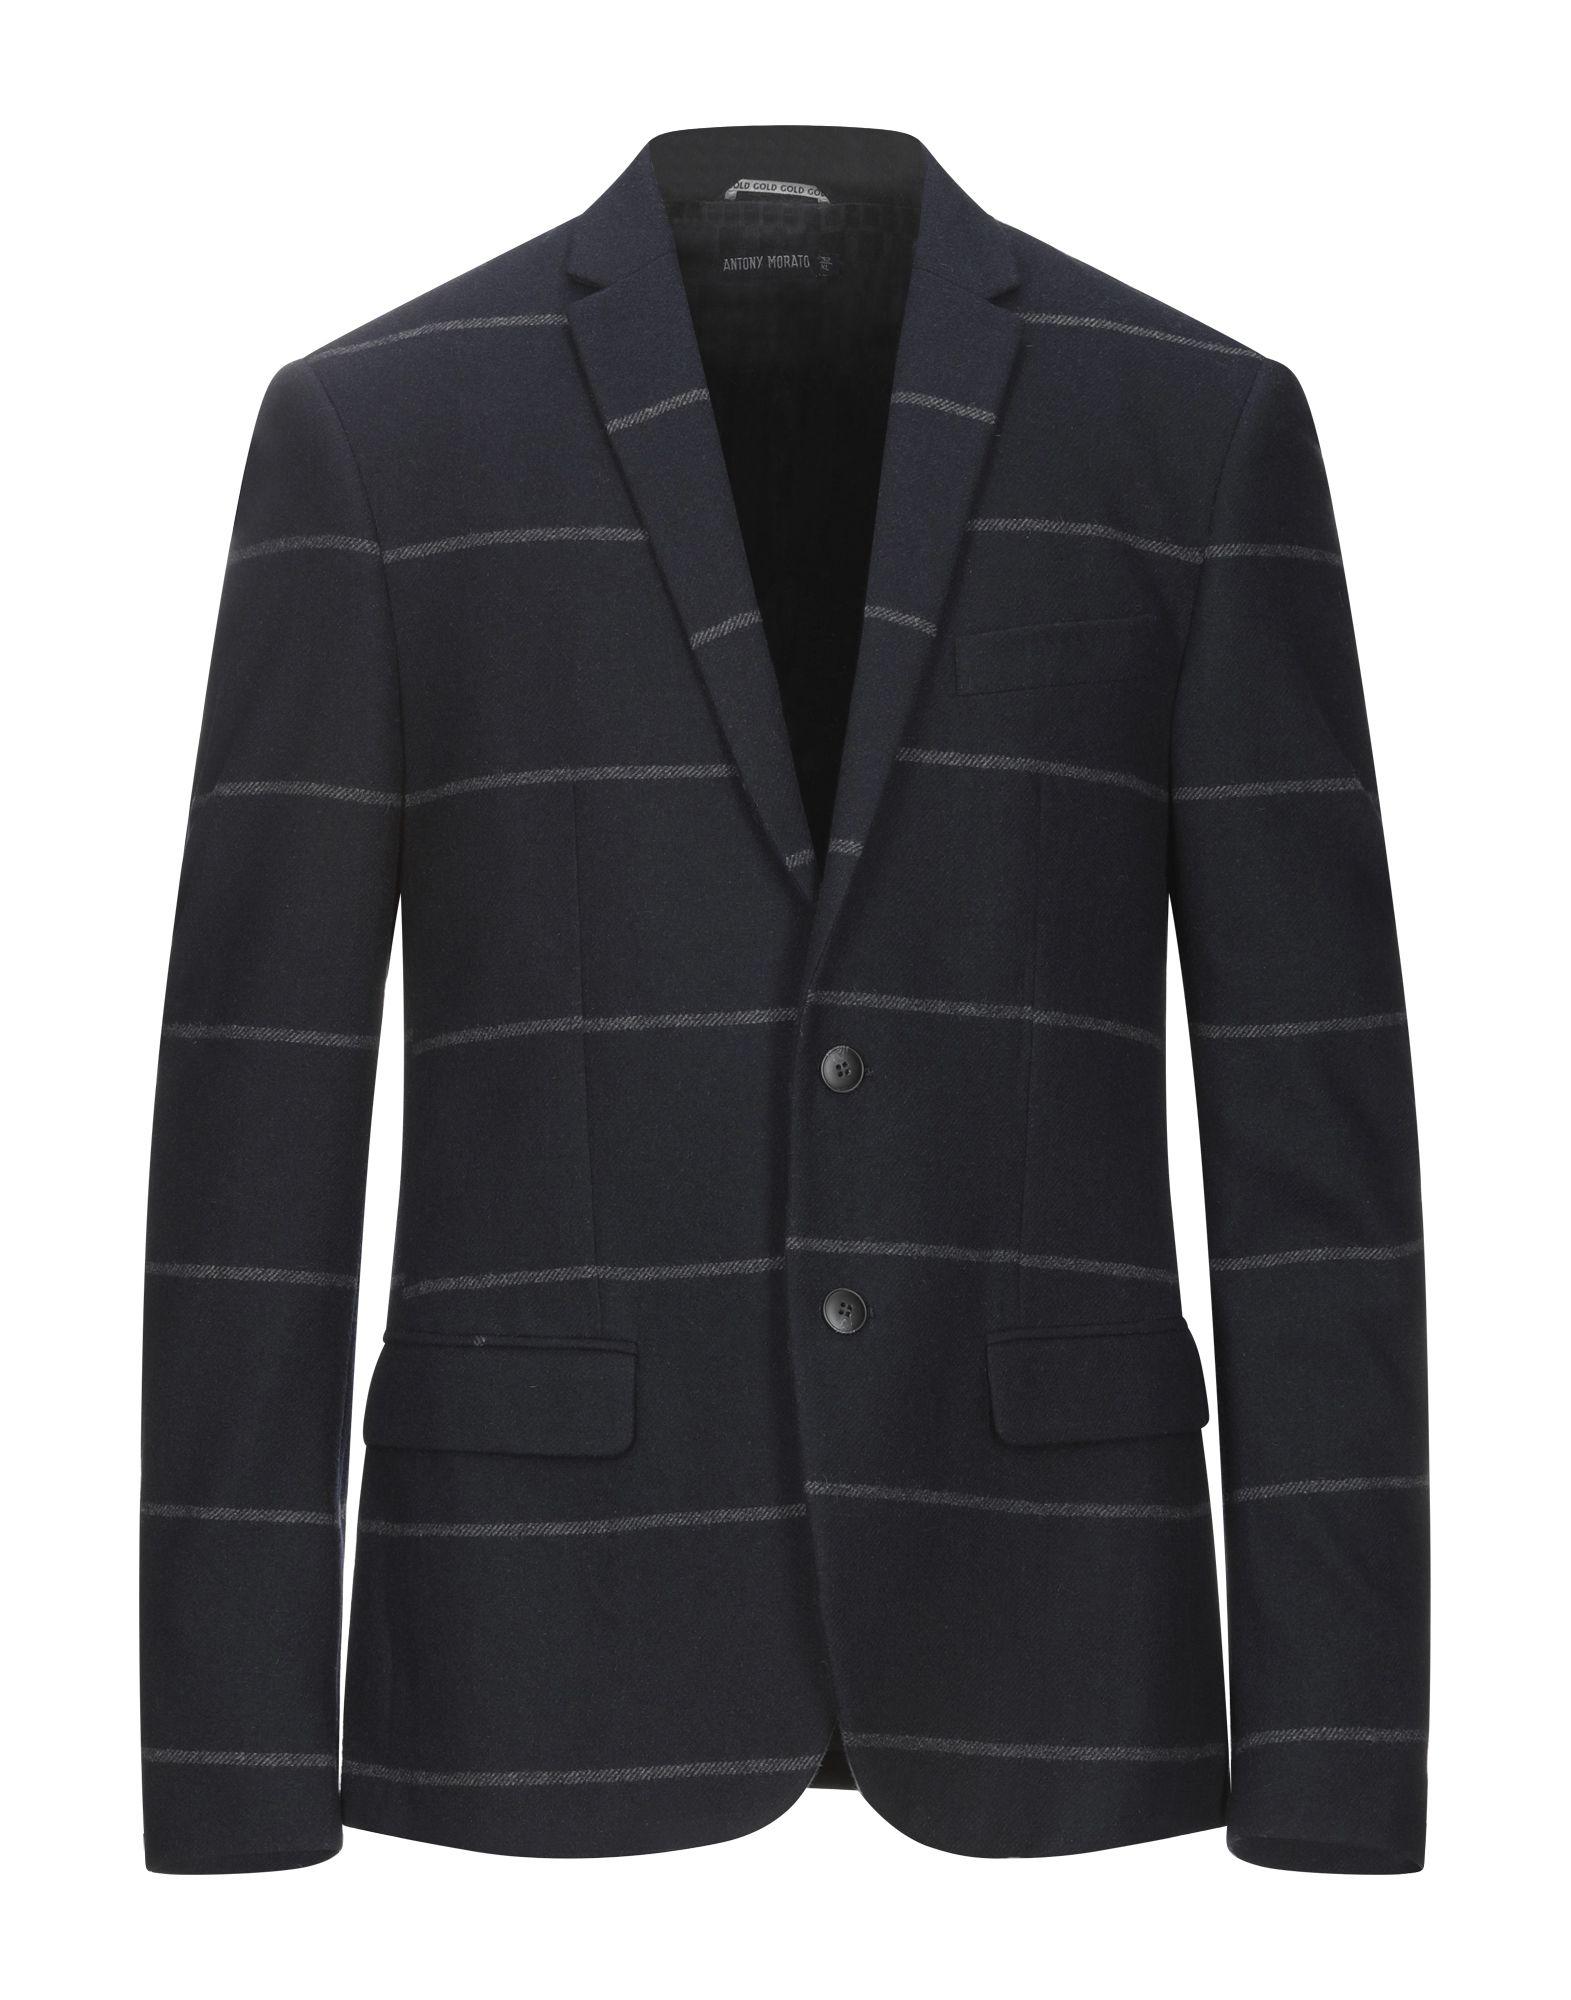 ANTONY MORATO Пиджак куртка antony morato mmlc00026 fa200005 9000